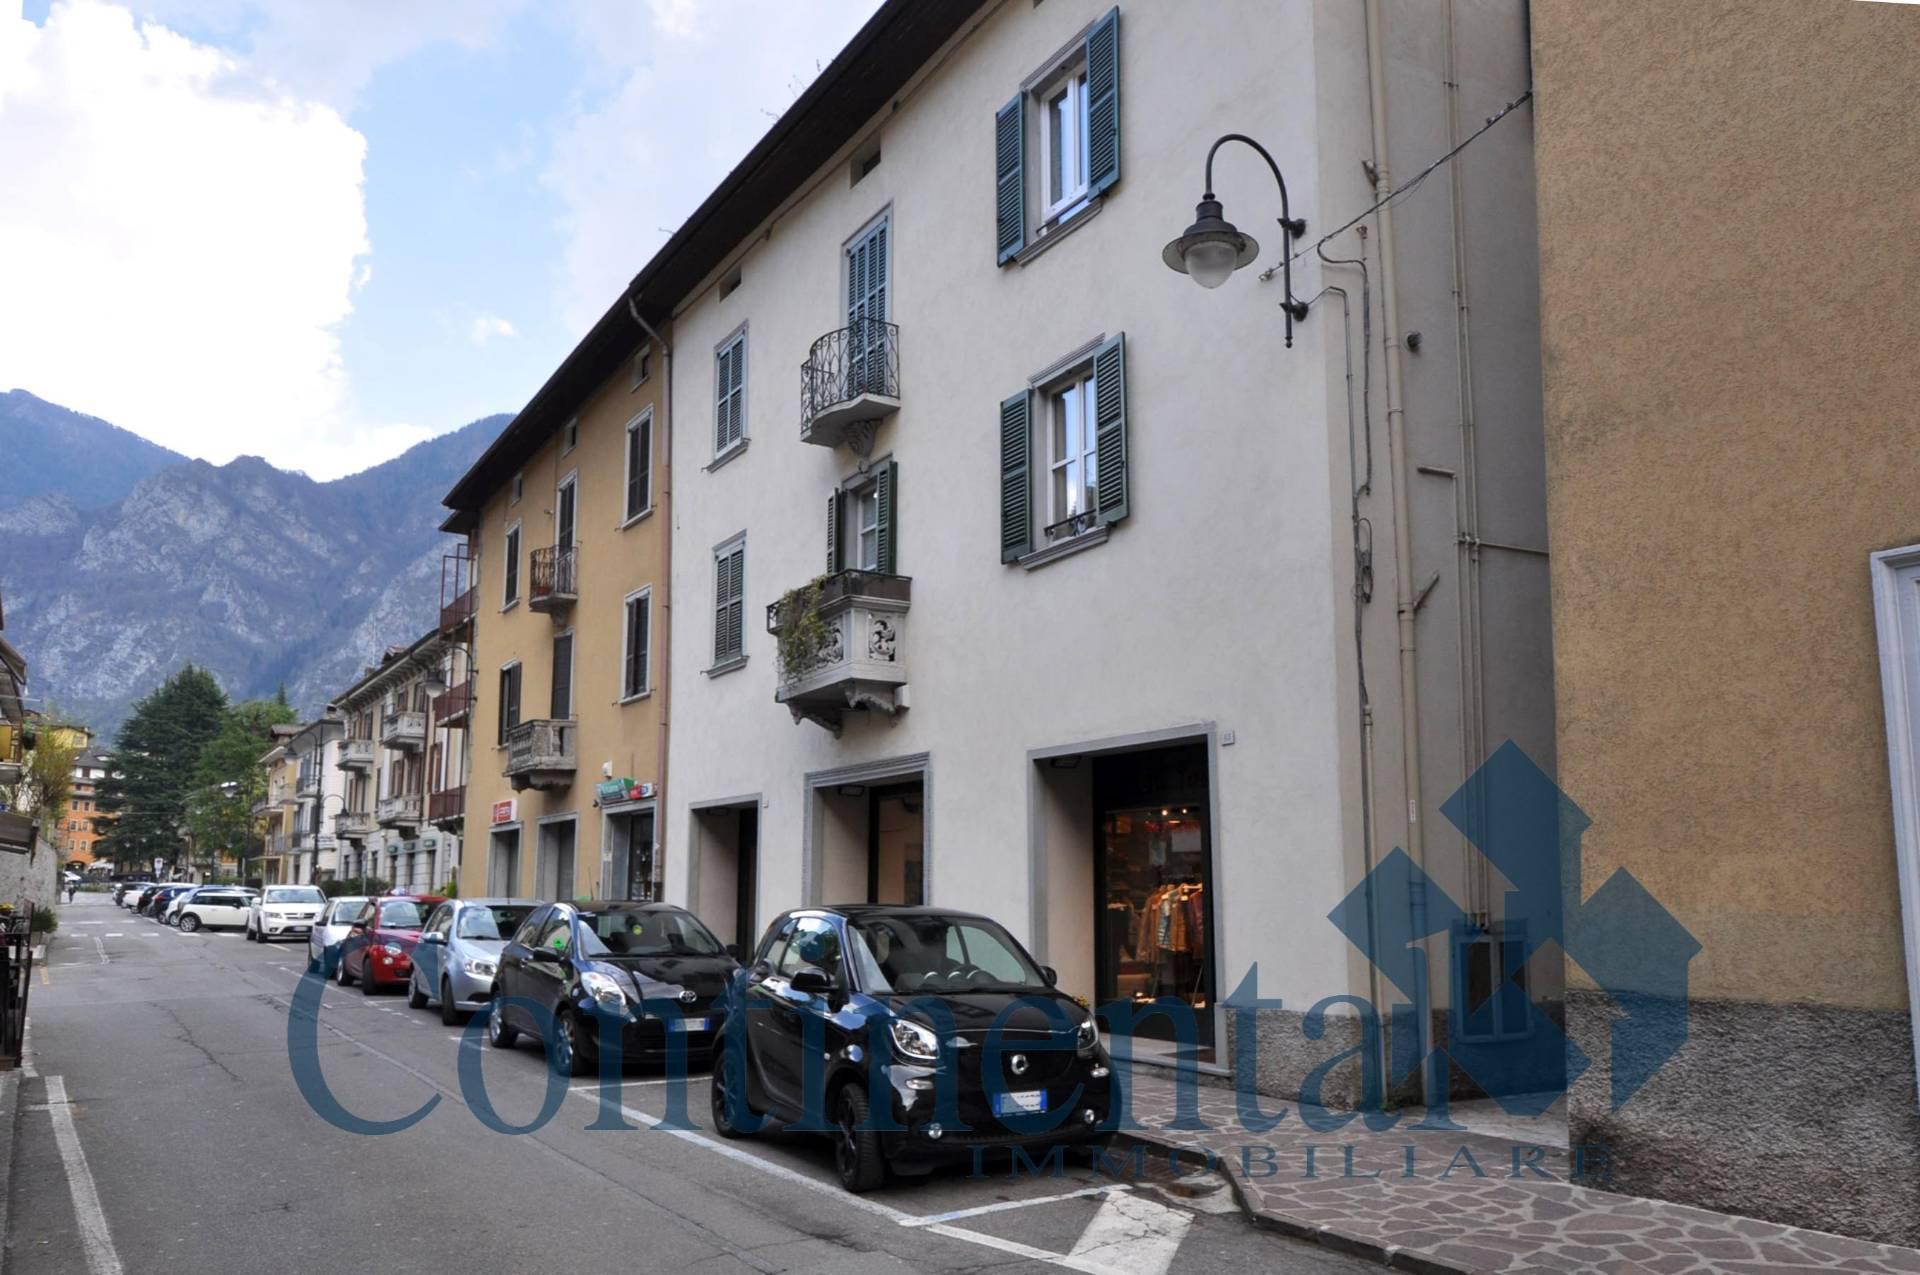 Attività / Licenza in vendita a Piazza Brembana, 9999 locali, Trattative riservate   PortaleAgenzieImmobiliari.it